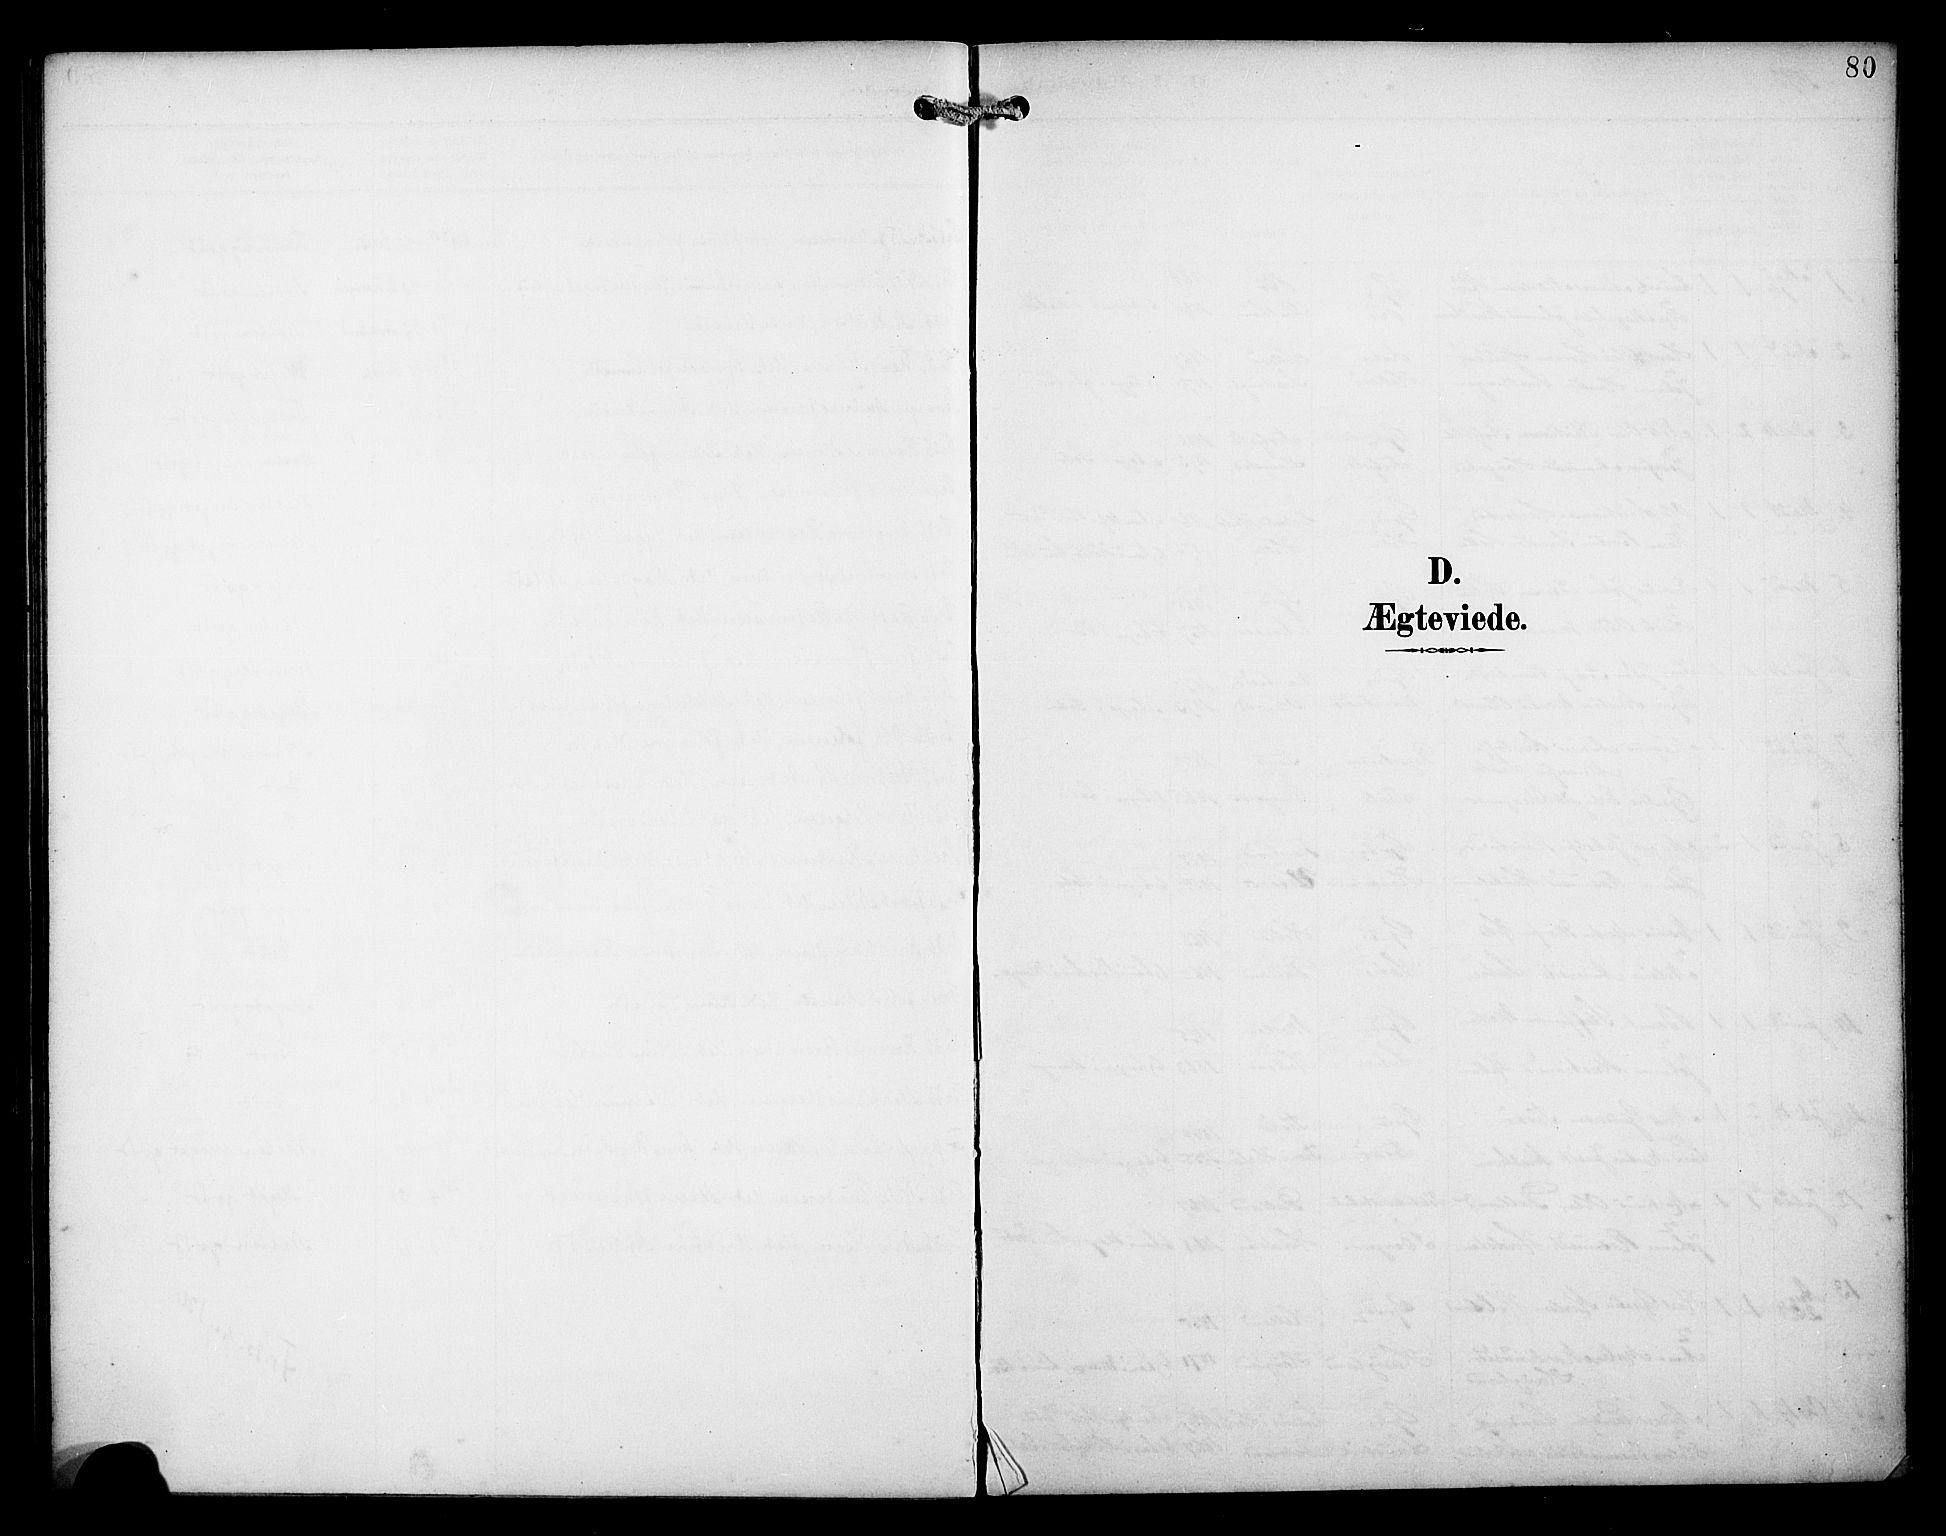 SAB, Manger sokneprestembete, H/Haa: Ministerialbok nr. B 2, 1893-1906, s. 80